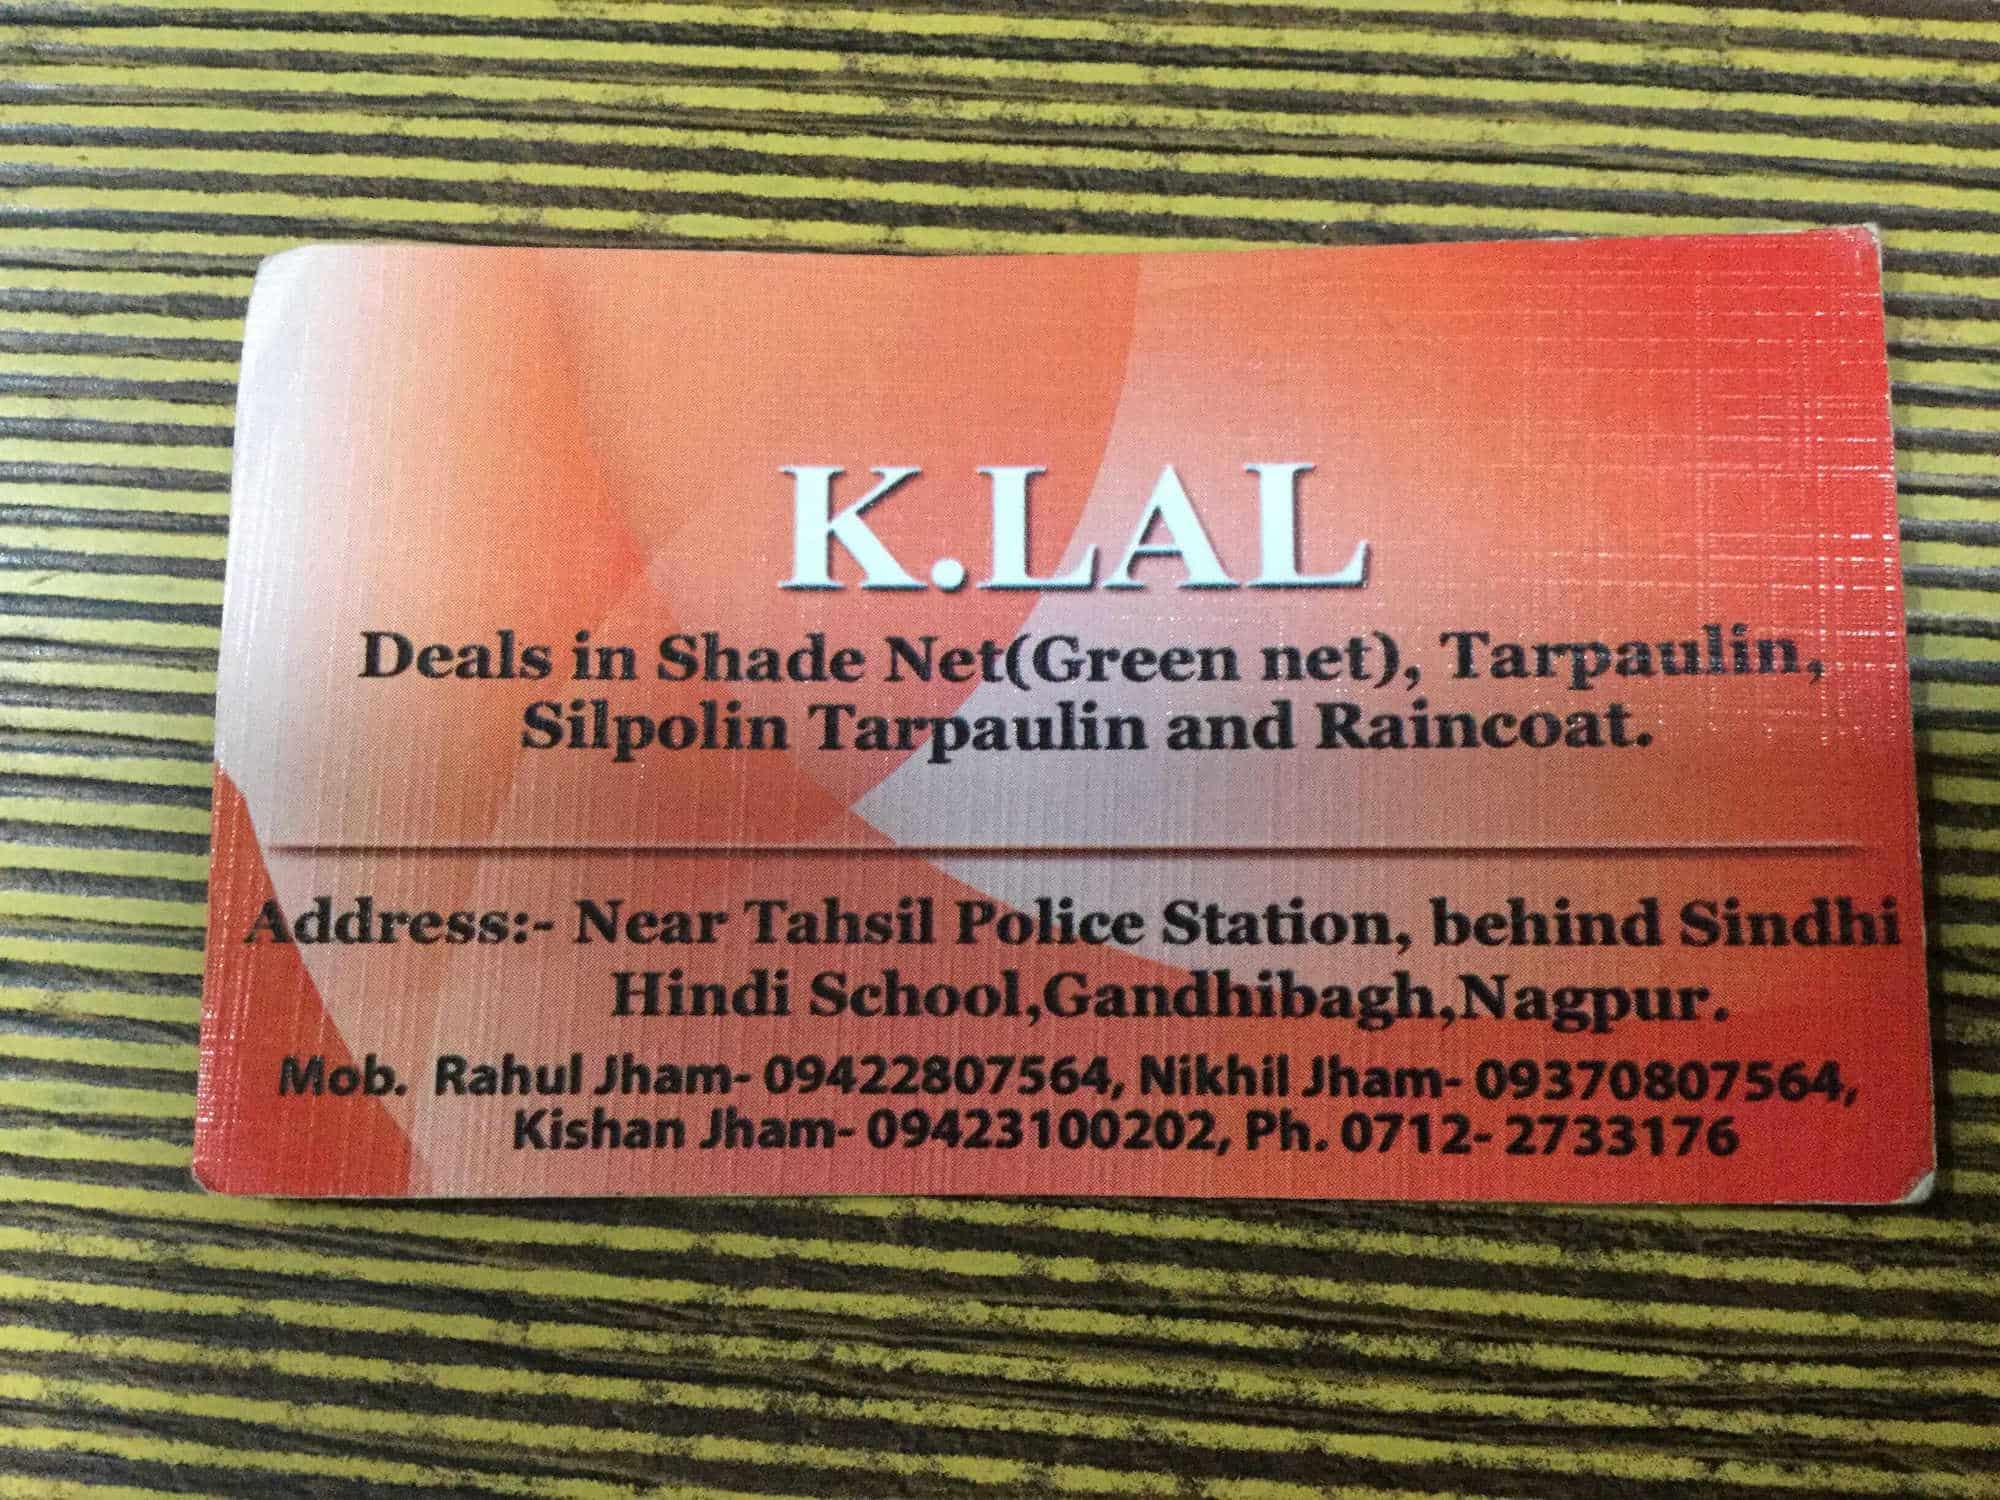 police station in hindi